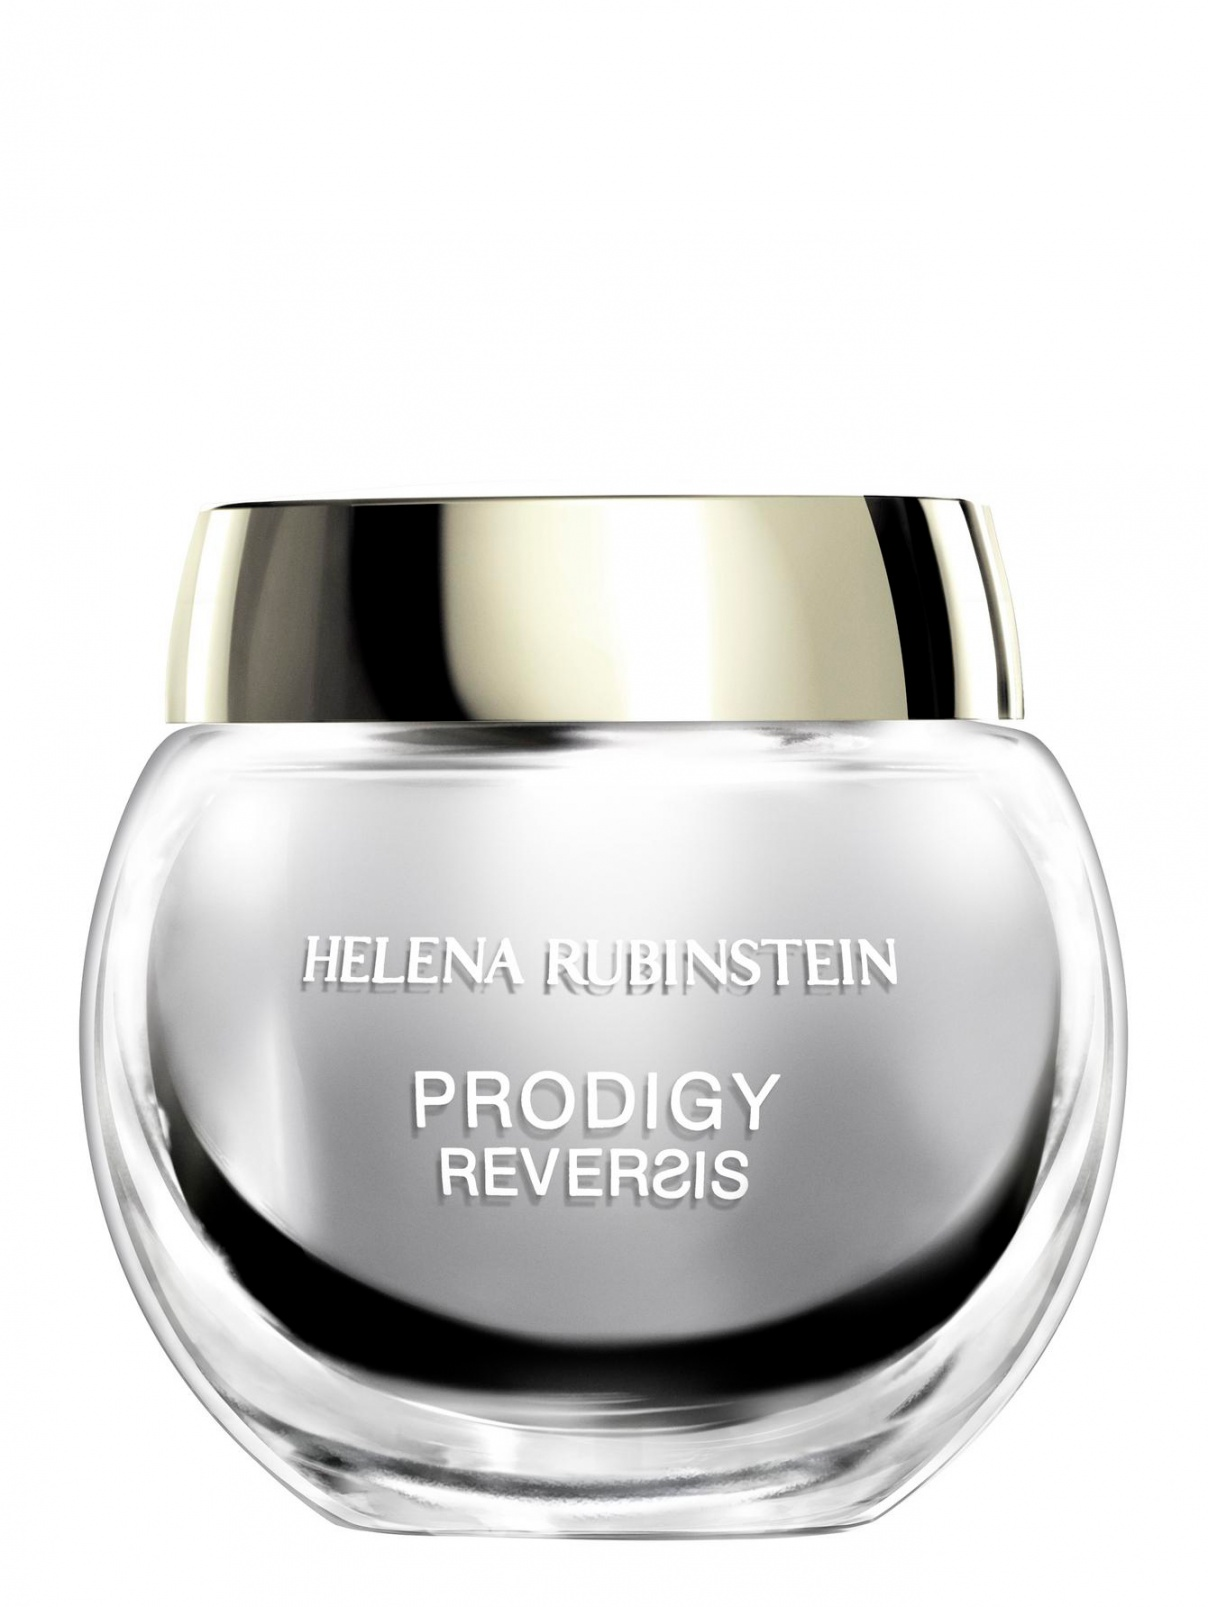 Крем для для сухой кожи - Prodigy Reversis, 50ml Helena Rubinstein  –  Общий вид